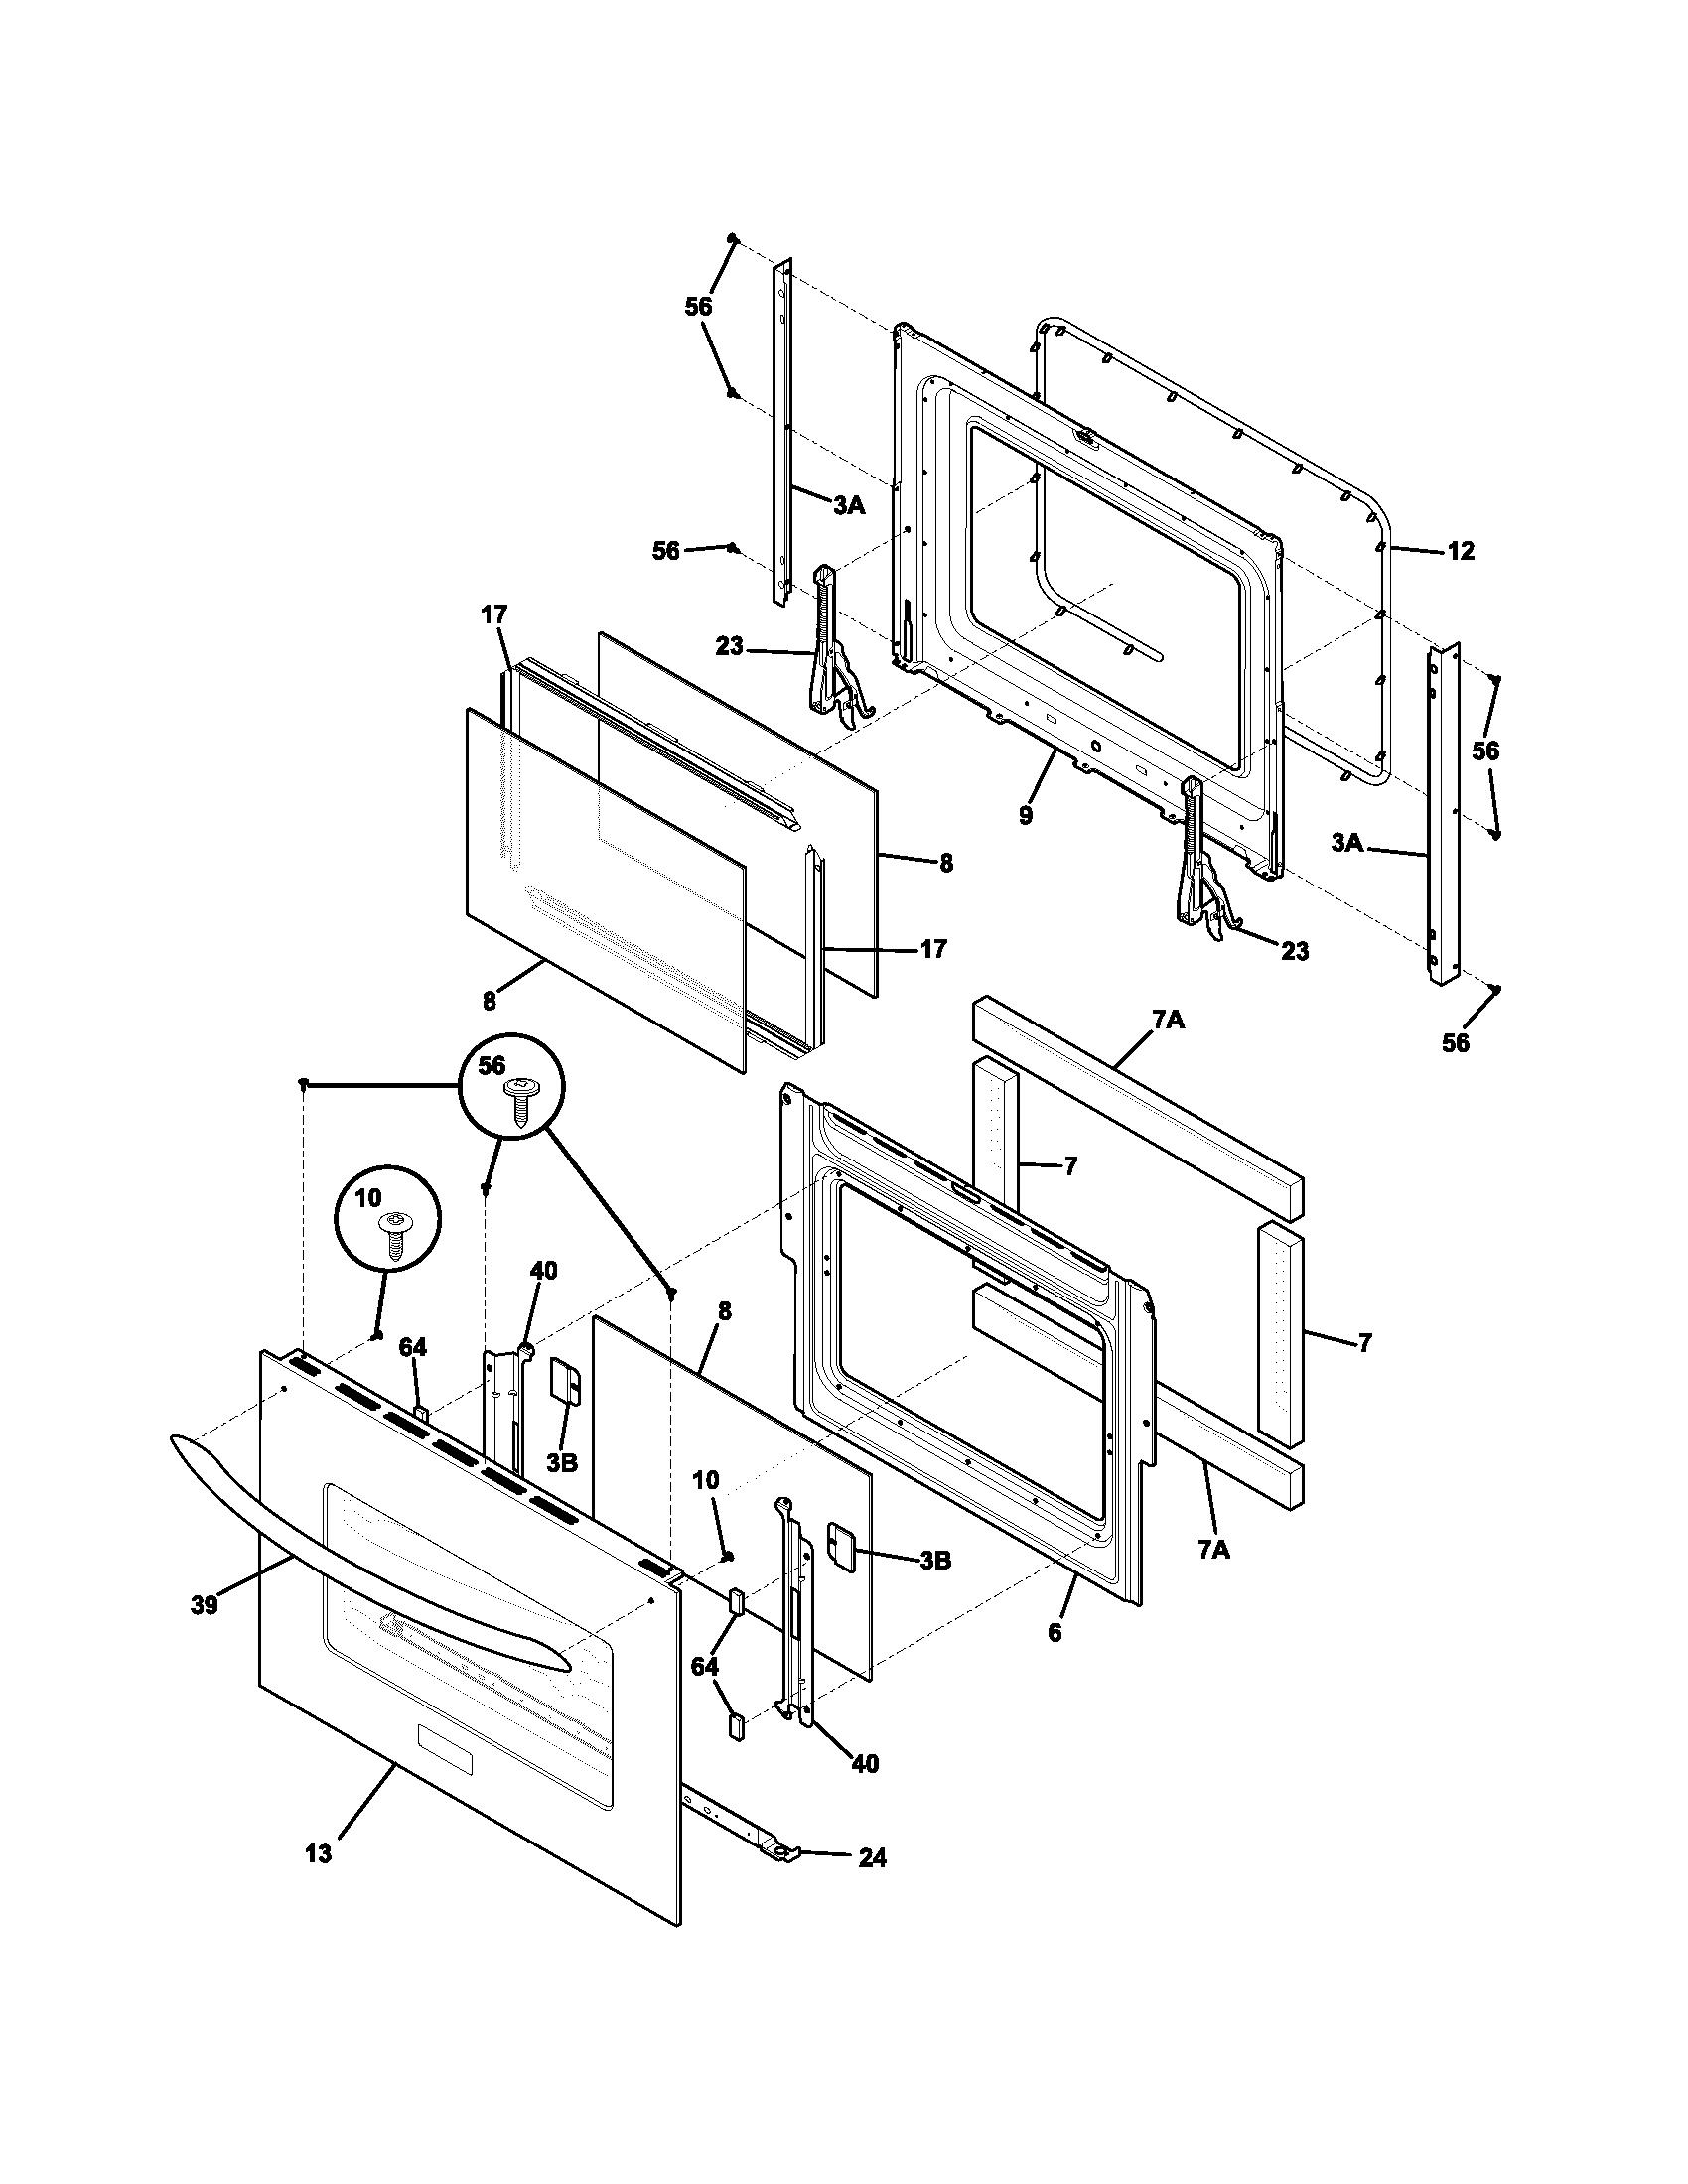 Frigidaire model PLEB30S9DCA built-in oven, electric